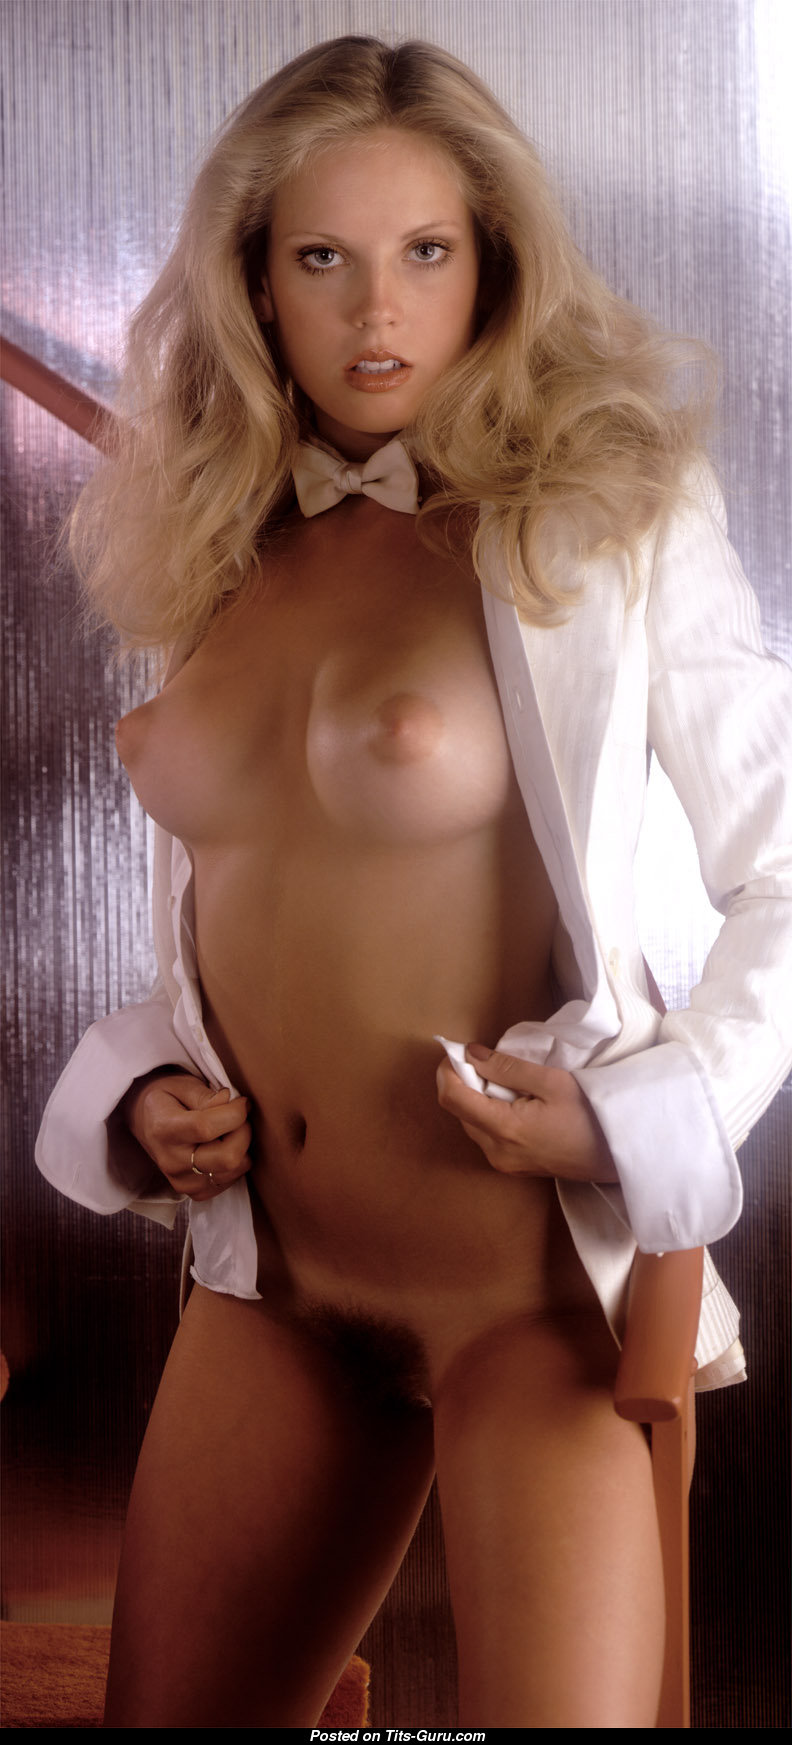 Pamela Jean Bryant nude: 1 photo